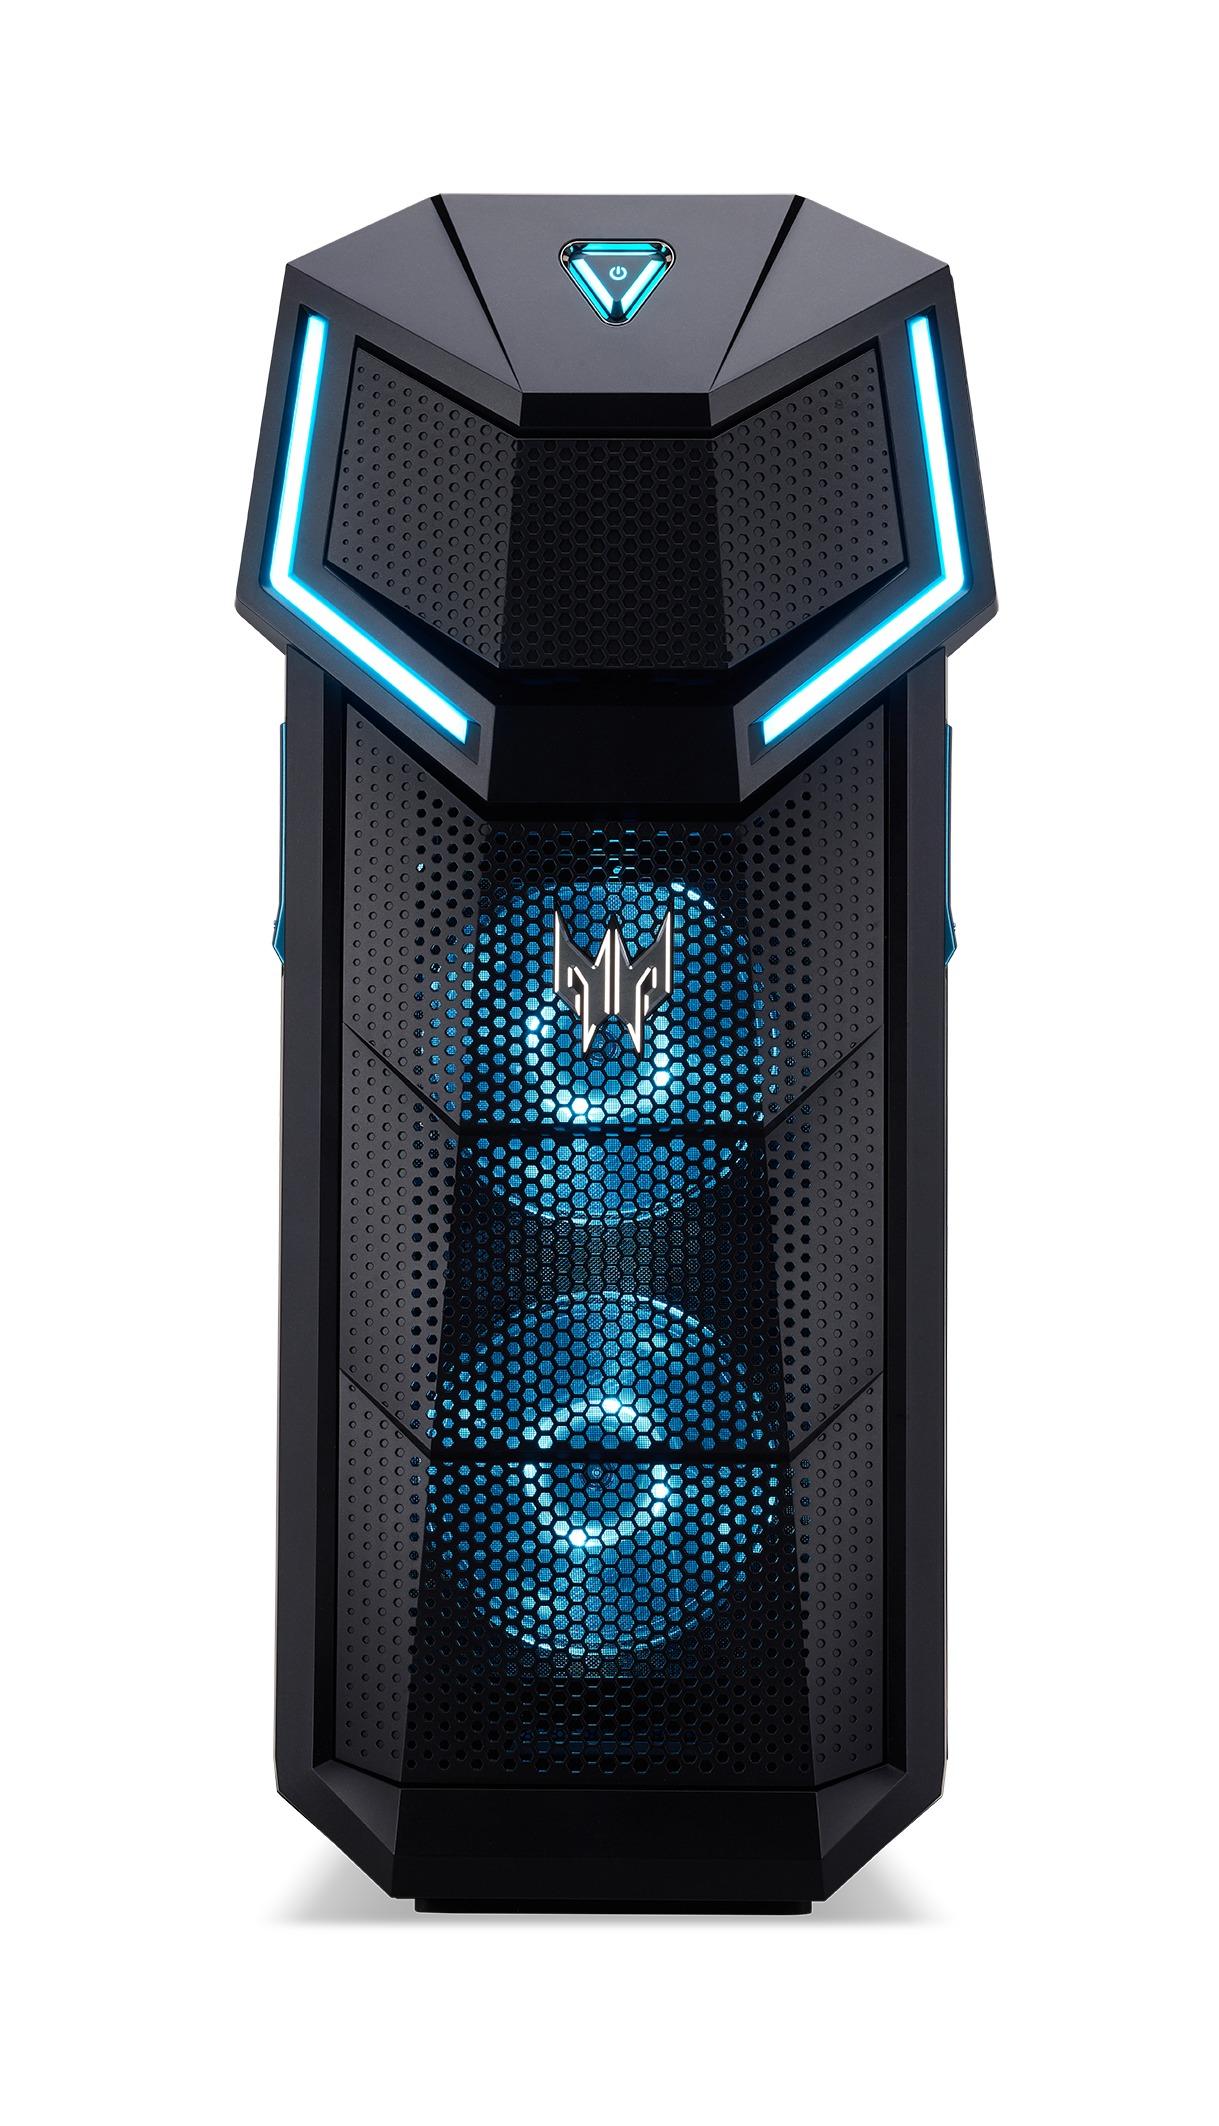 Korting Acer Predator Orion 5000 610 I9290 S desktop